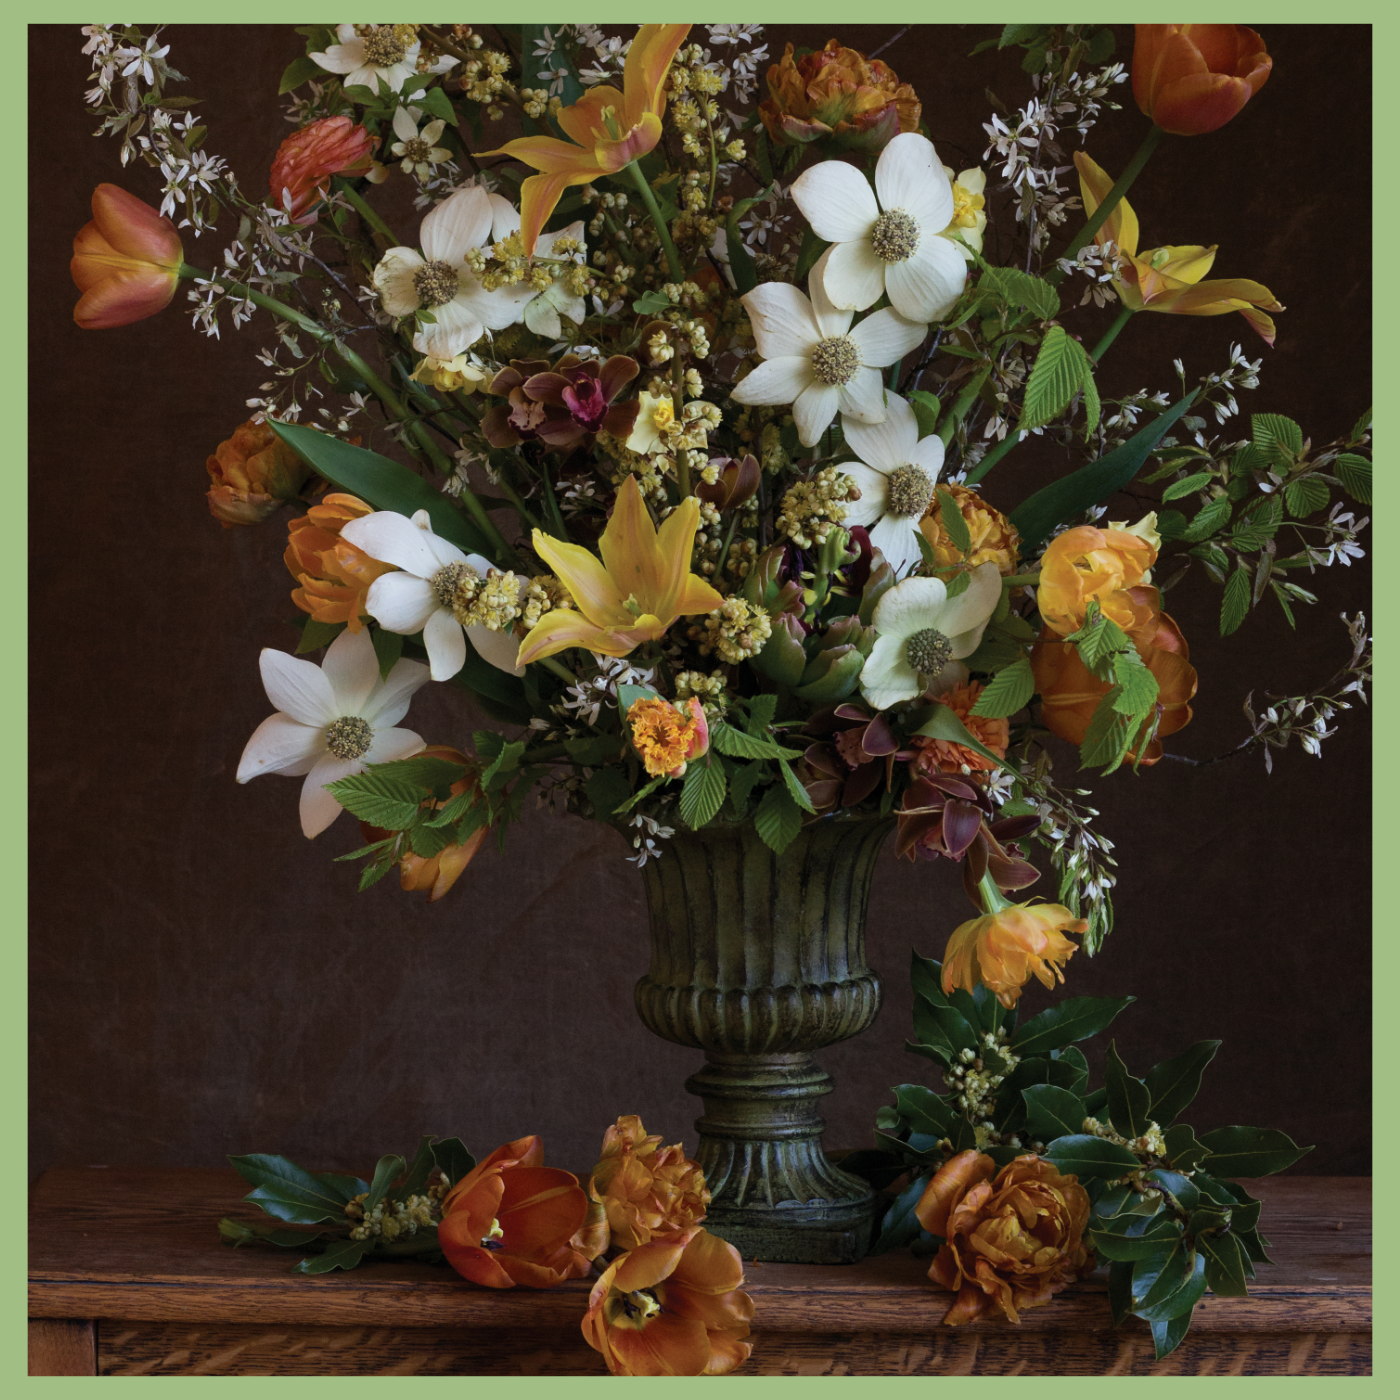 Floral arrangement white and orange flowers